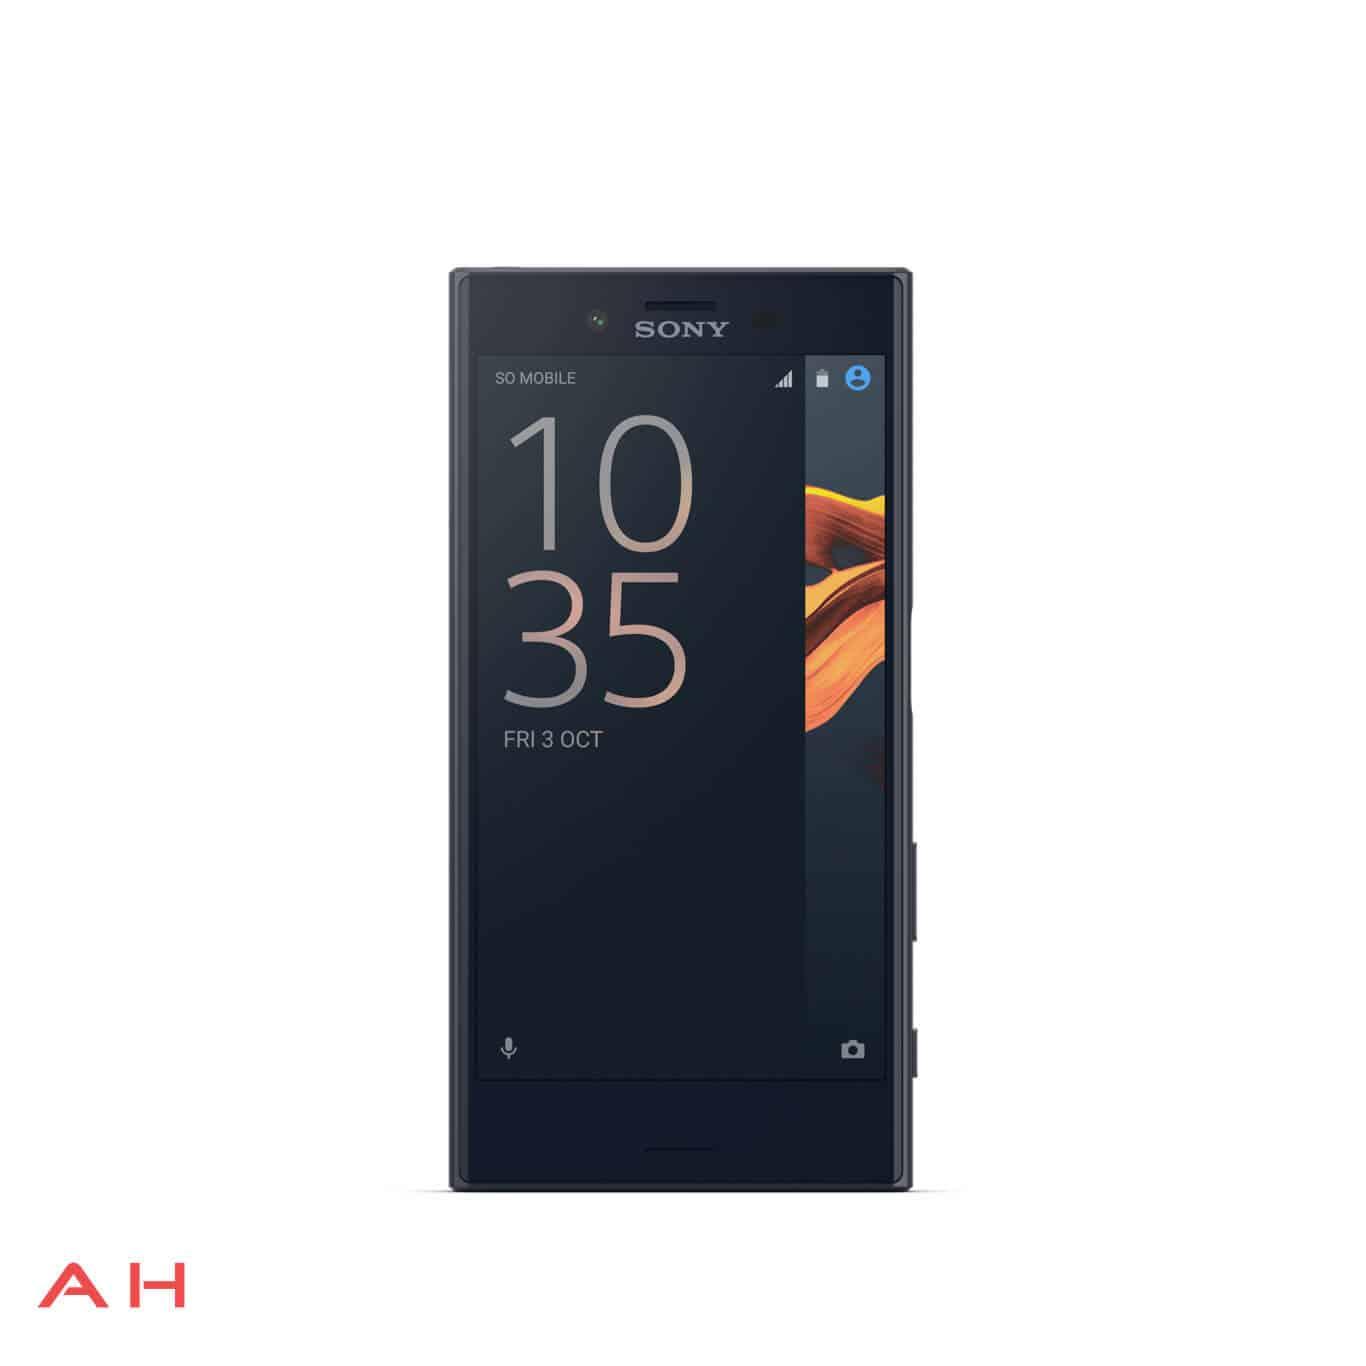 Sony Xperia X Compact AH 10